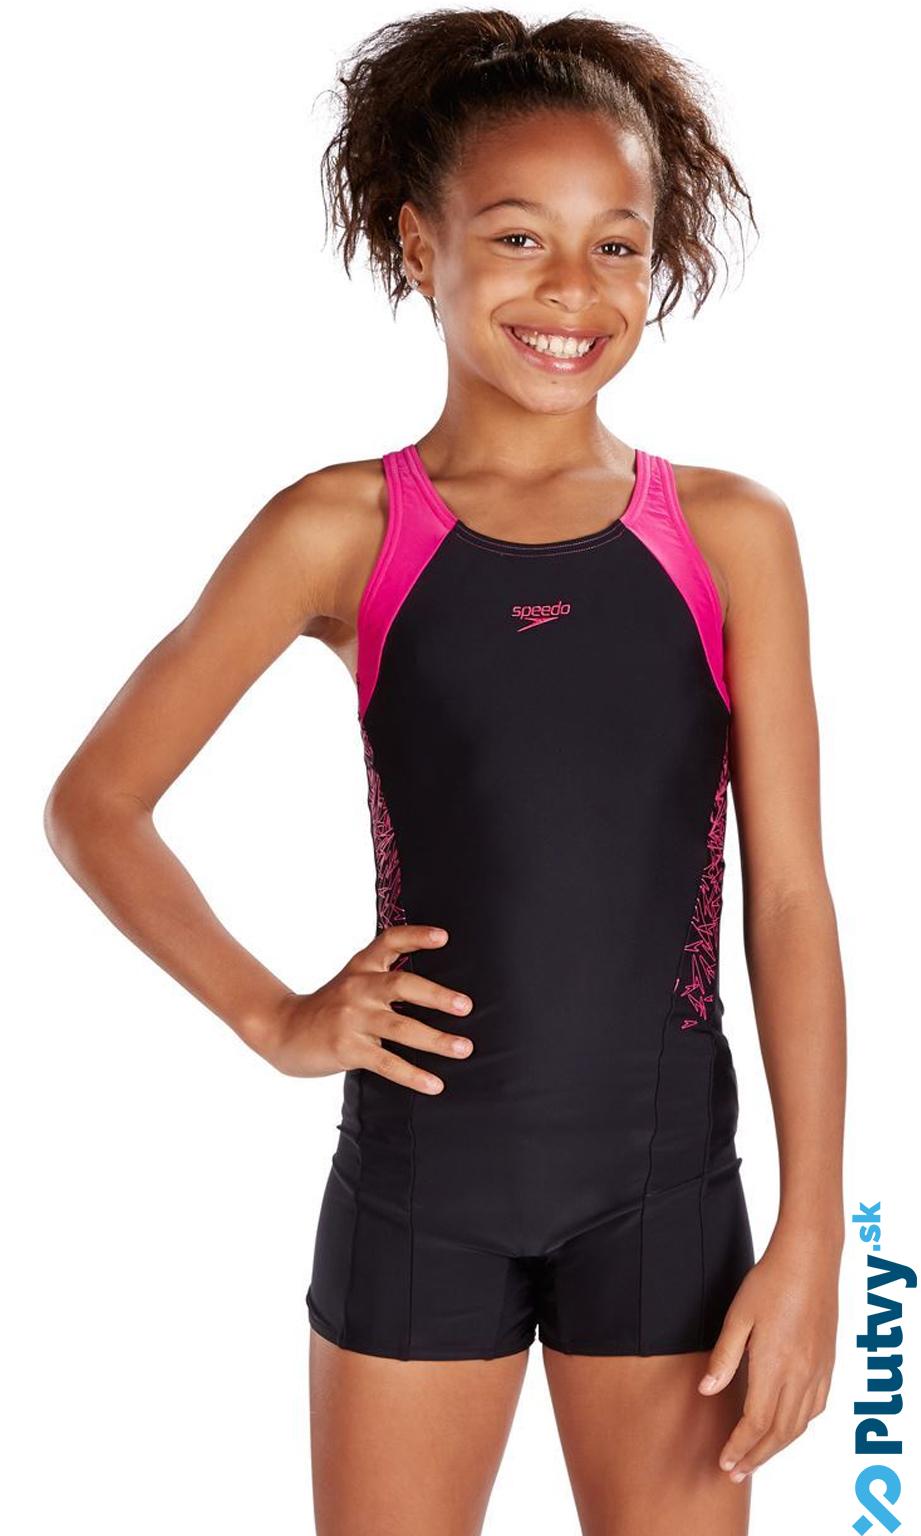 sportove-plavky-pre-juniorov-dievcata-speedo-boom-splice-legsuit